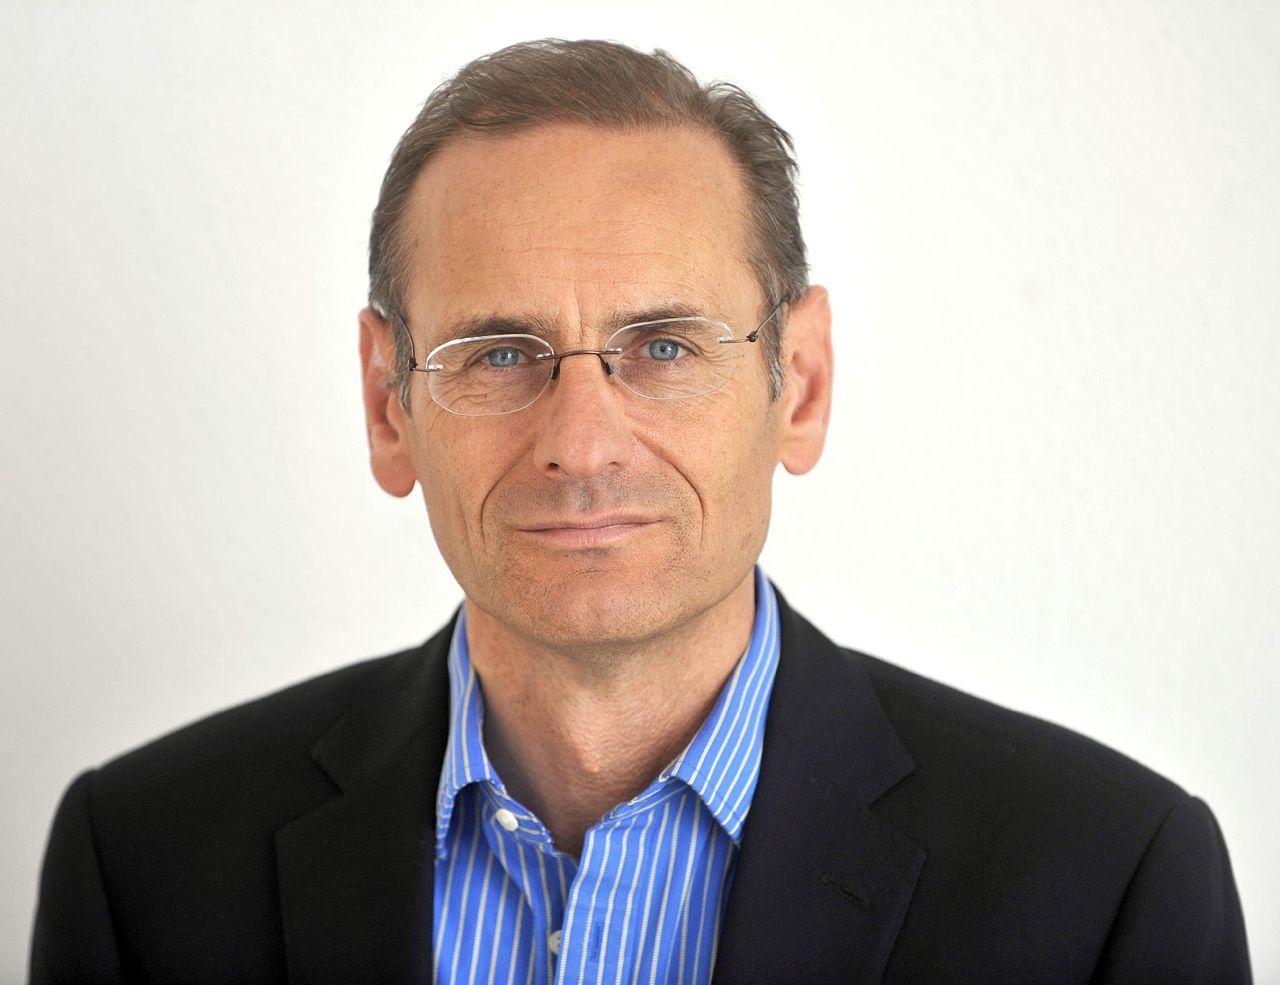 Roger Harrabin, Associate Fellow of Green Templeton College